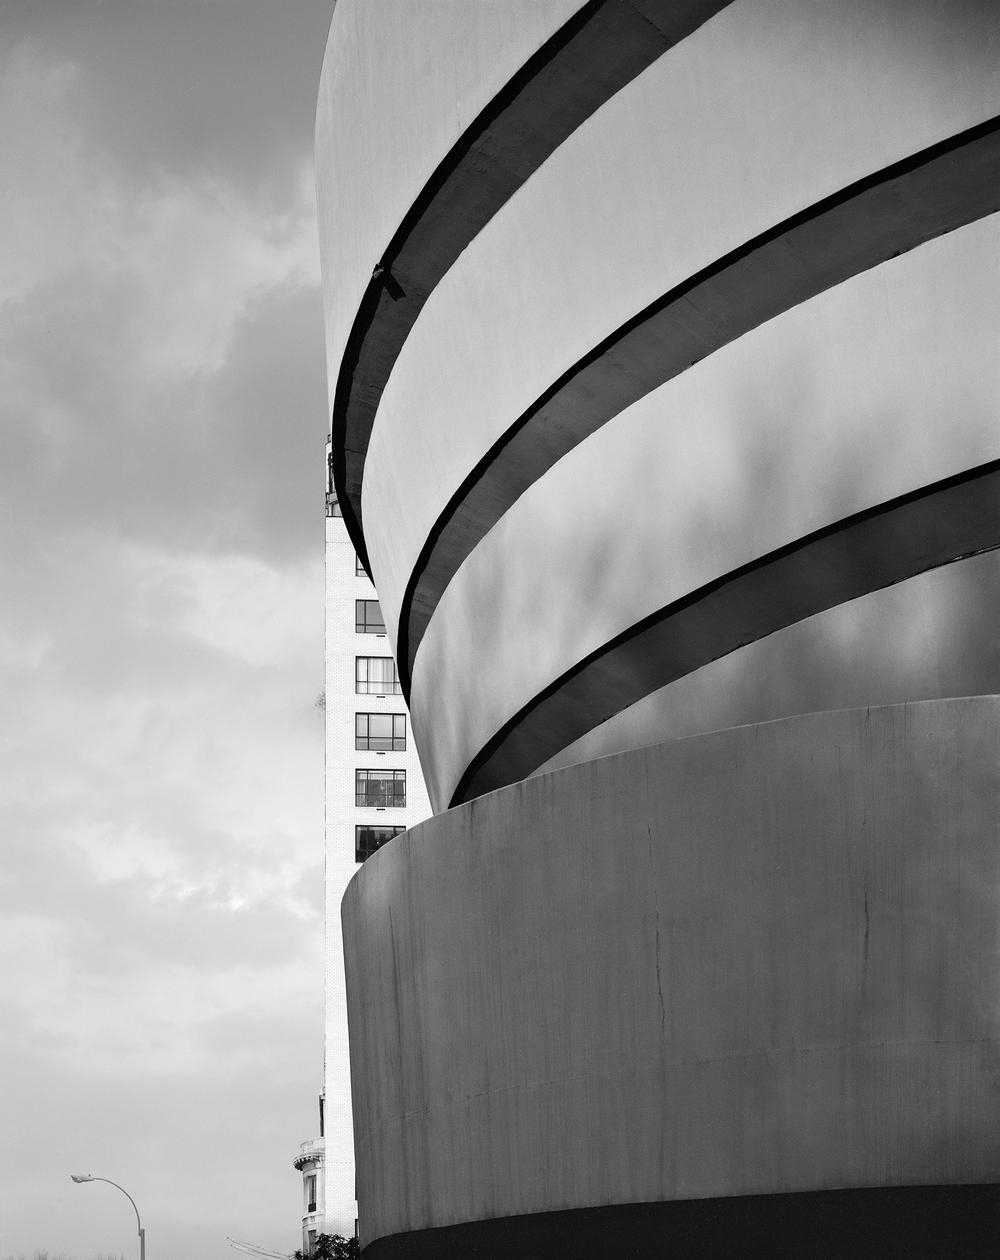 10__34-Guggenheim-508-corner-corrected---copy.png